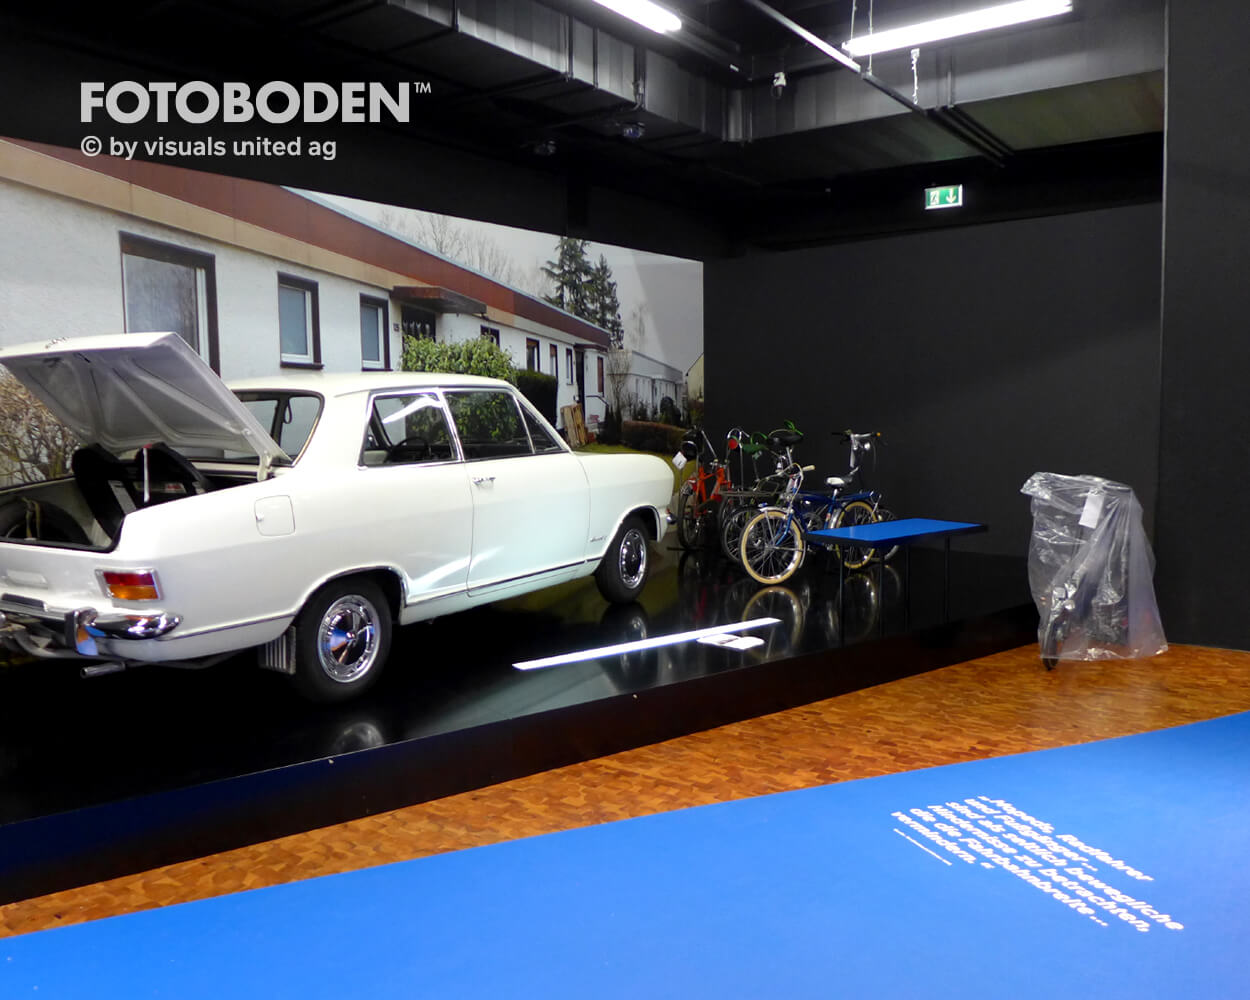 Fahrrad7 Ausstellung Museum  Raumkonzept Stimmung Museumsboden Ausstellungsboden Fotoboden Vinylboden Flooring Individuell Event